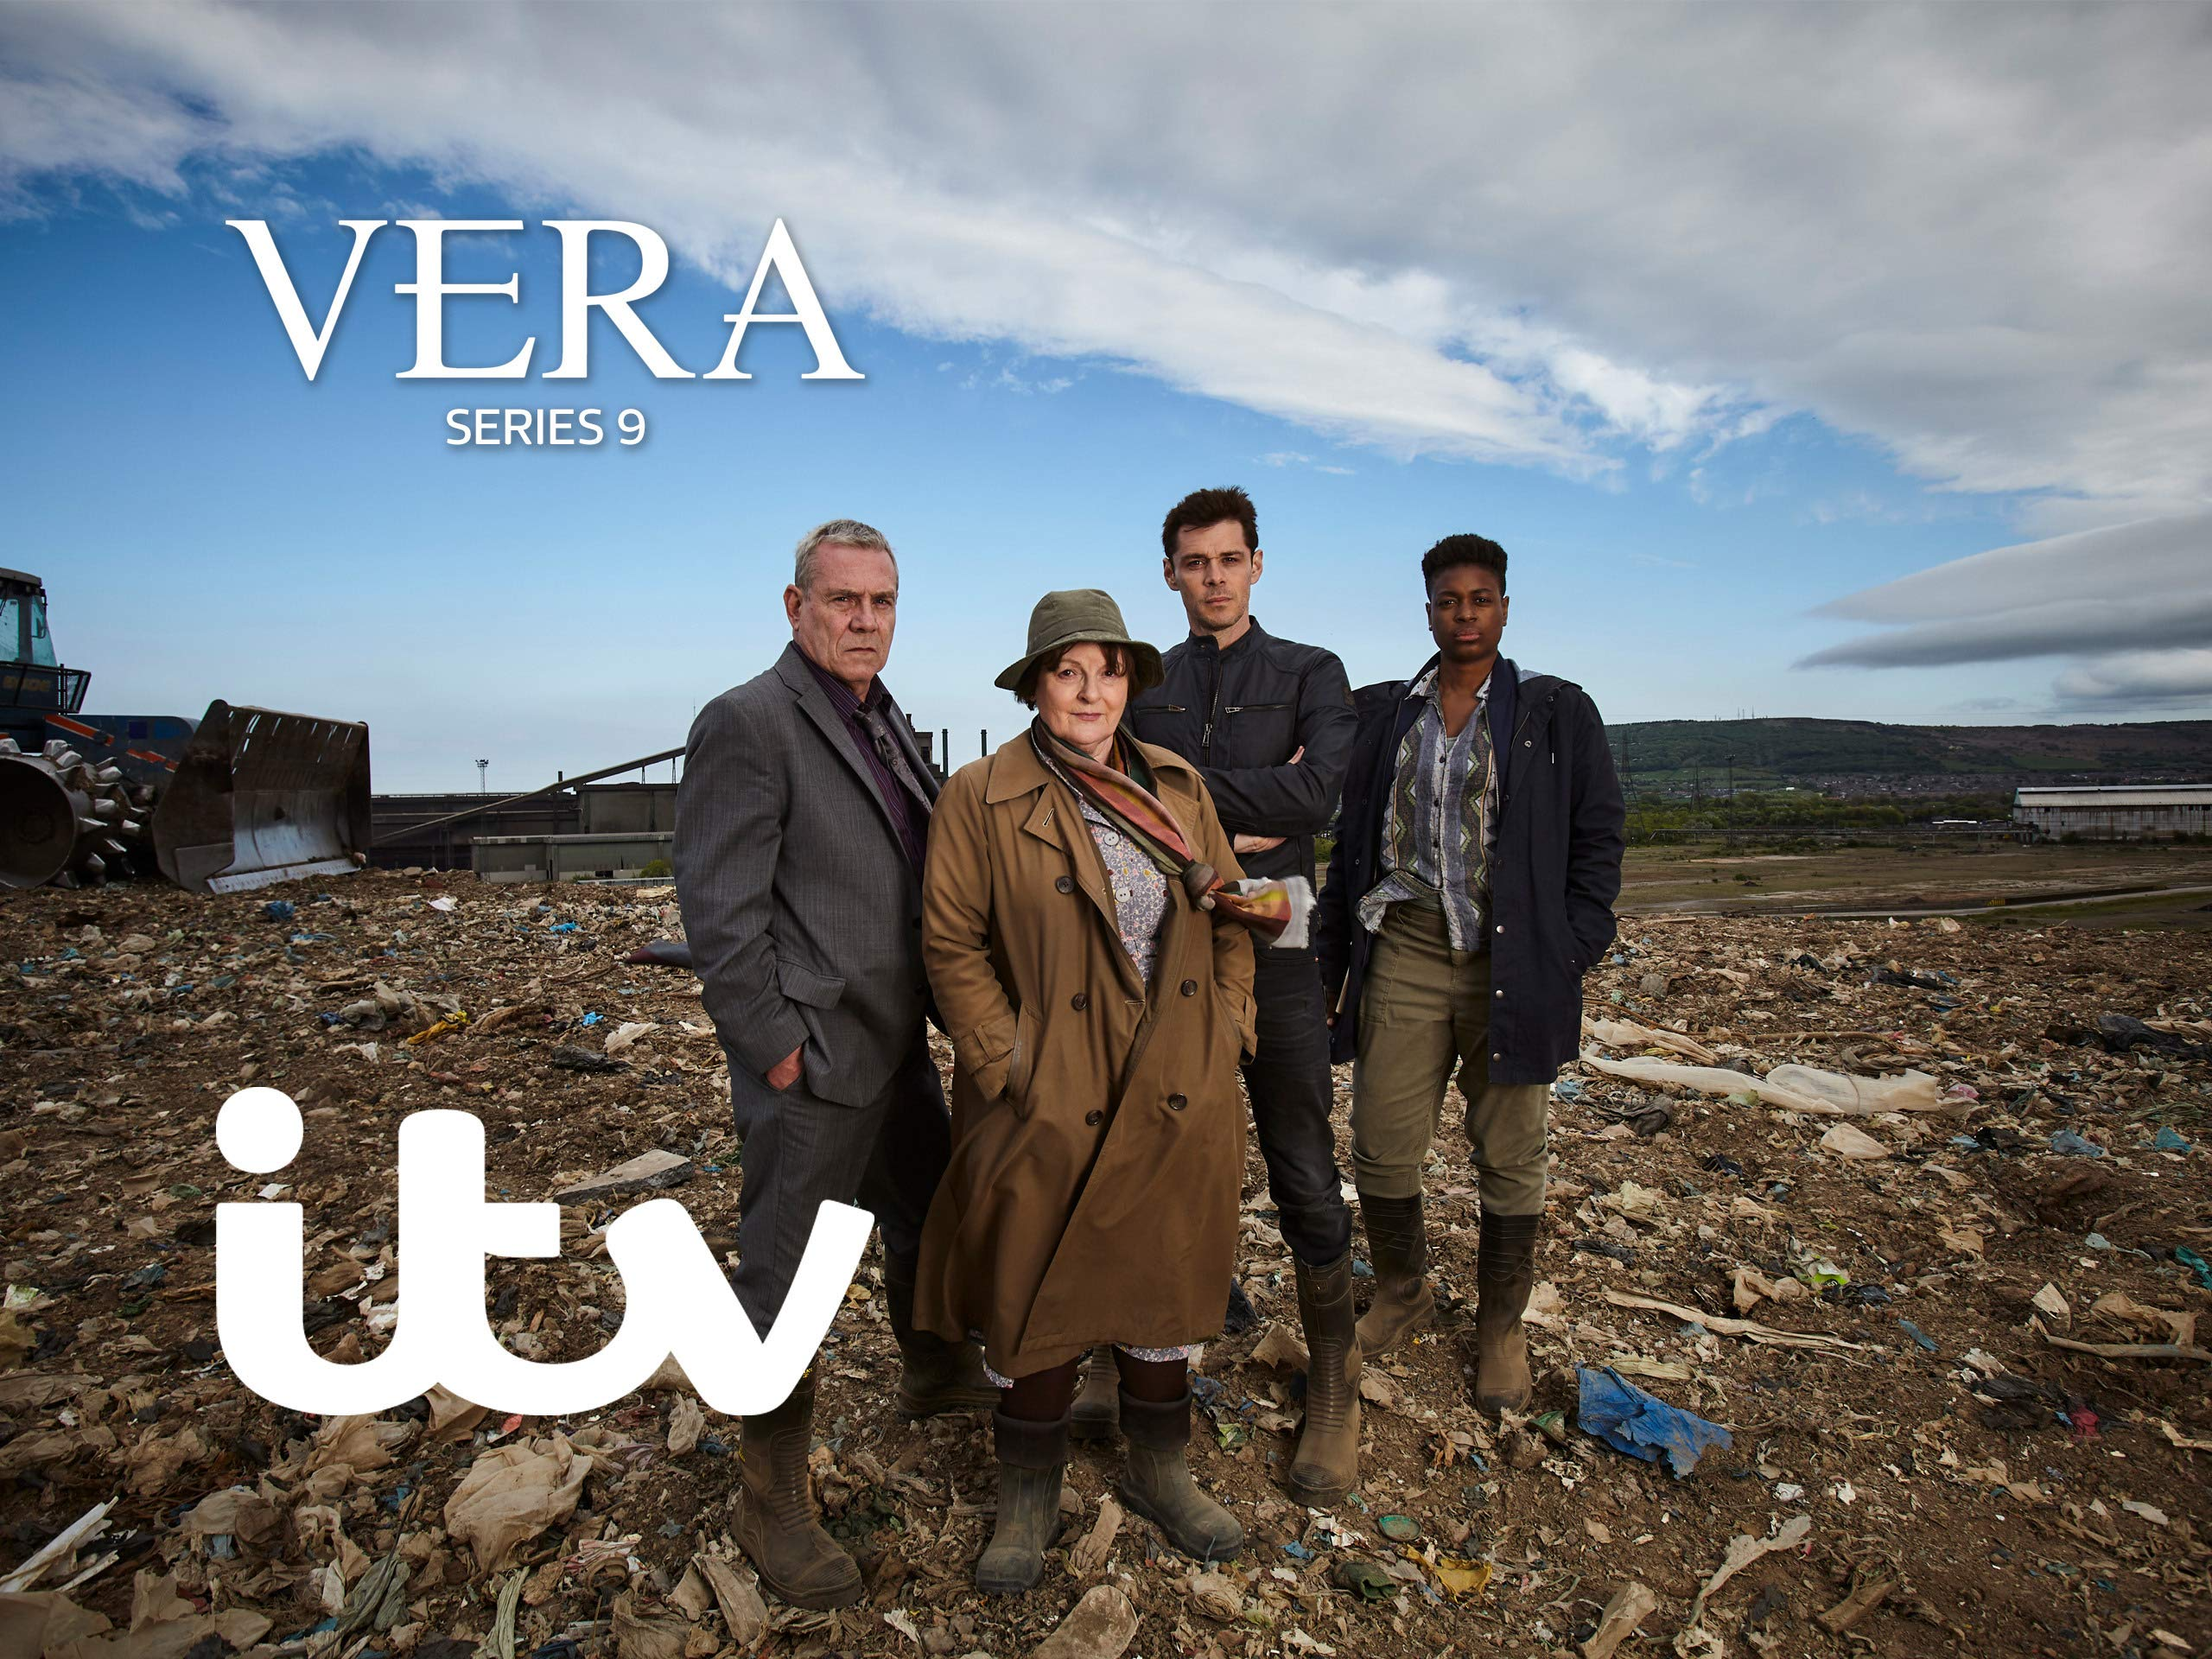 Vera Season 11 Spoilers